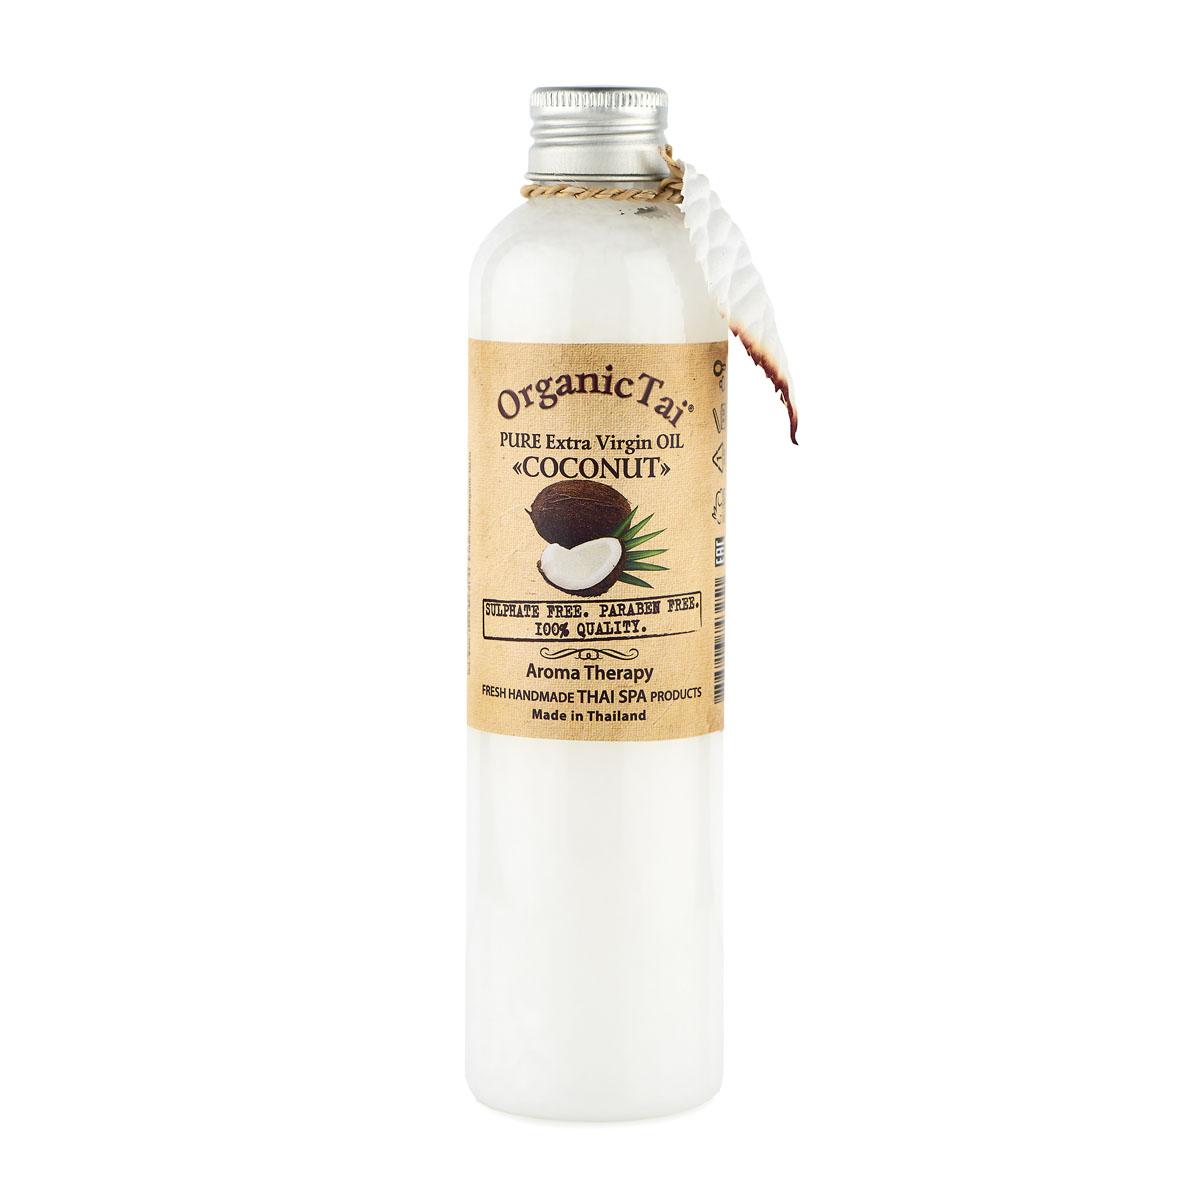 OrganicTai Чистое базовое масло КОКОСА холодного отжима, 260 мл organictai чистое базовое масло кокоса холодного отжима 1000 мл